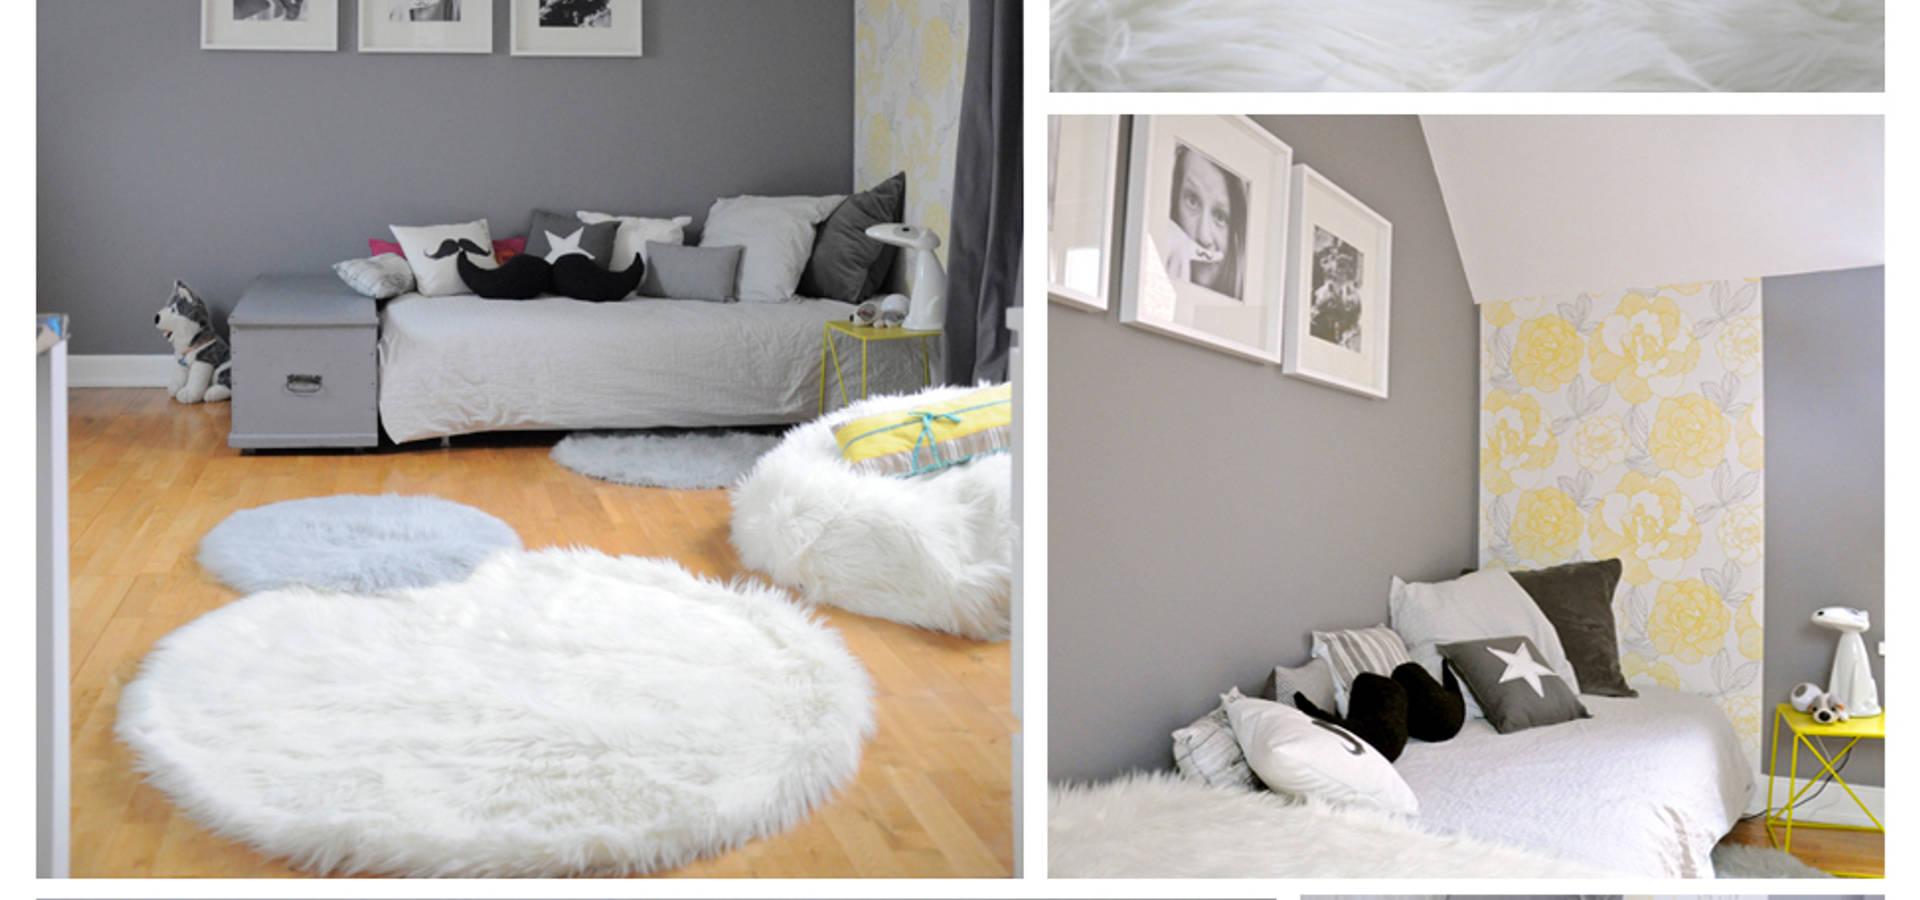 espace douche de id e logis homify. Black Bedroom Furniture Sets. Home Design Ideas